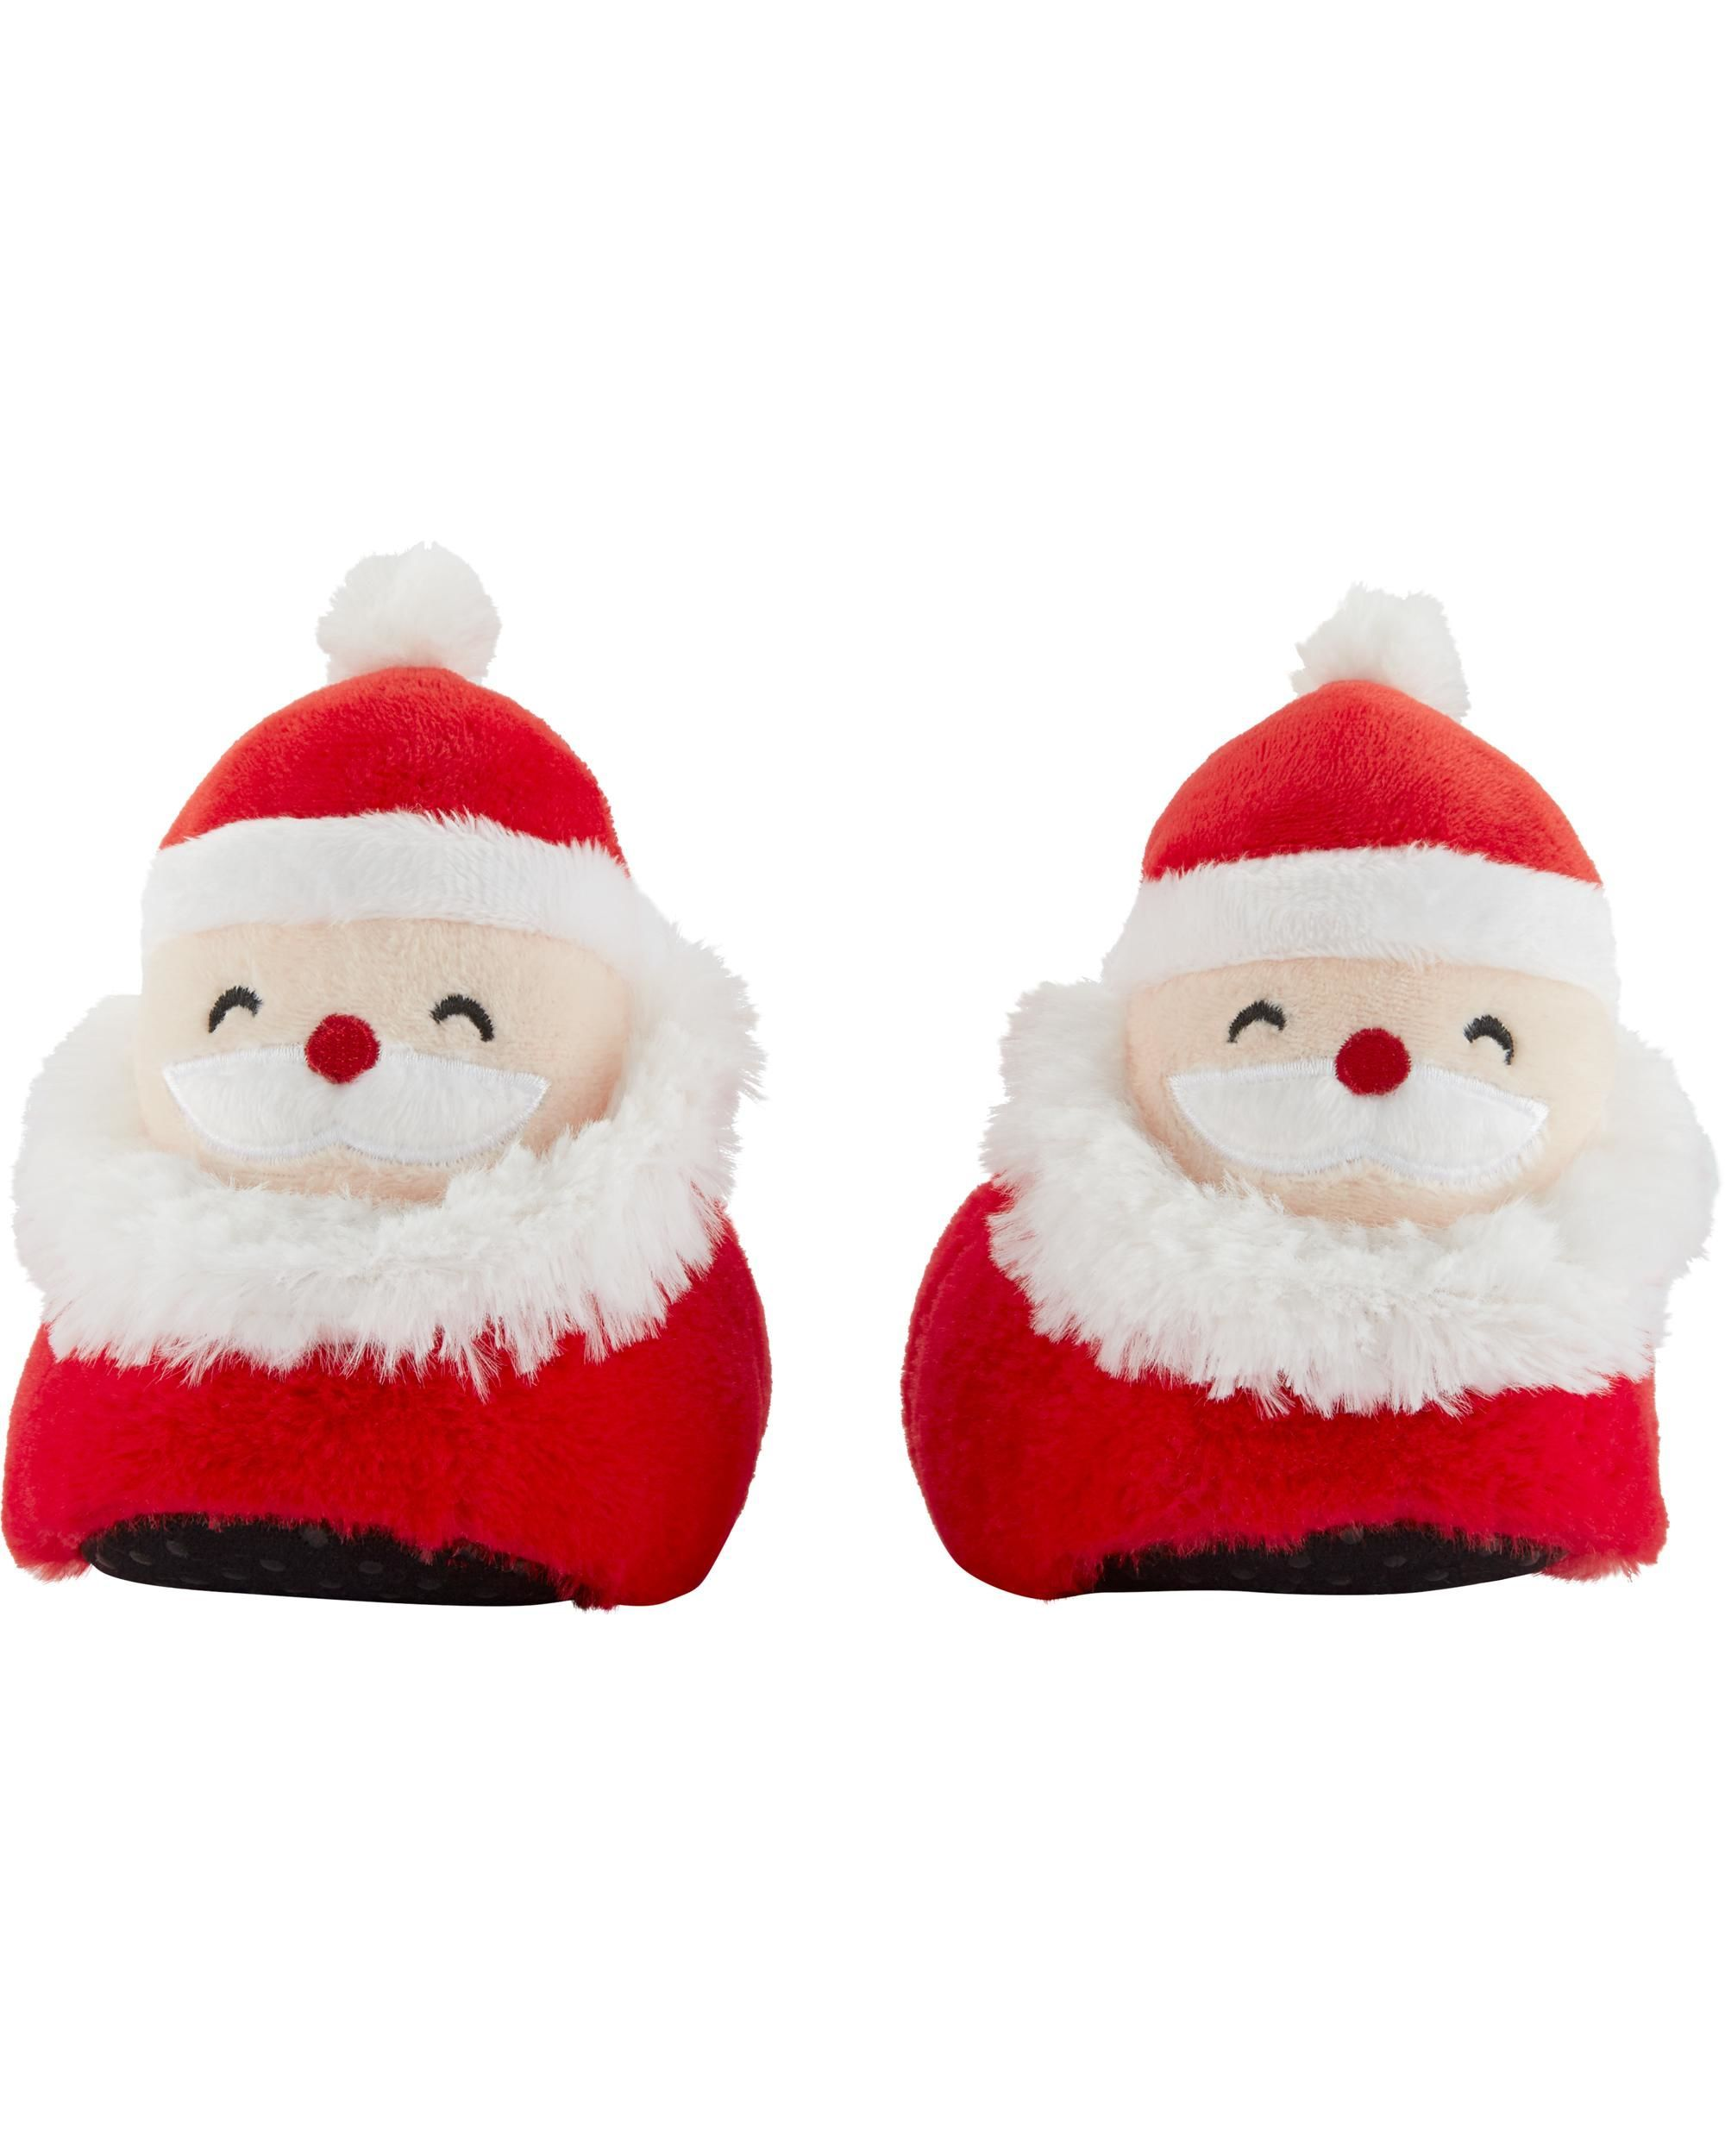 84ded9ee37 Carter s Santa Slippers